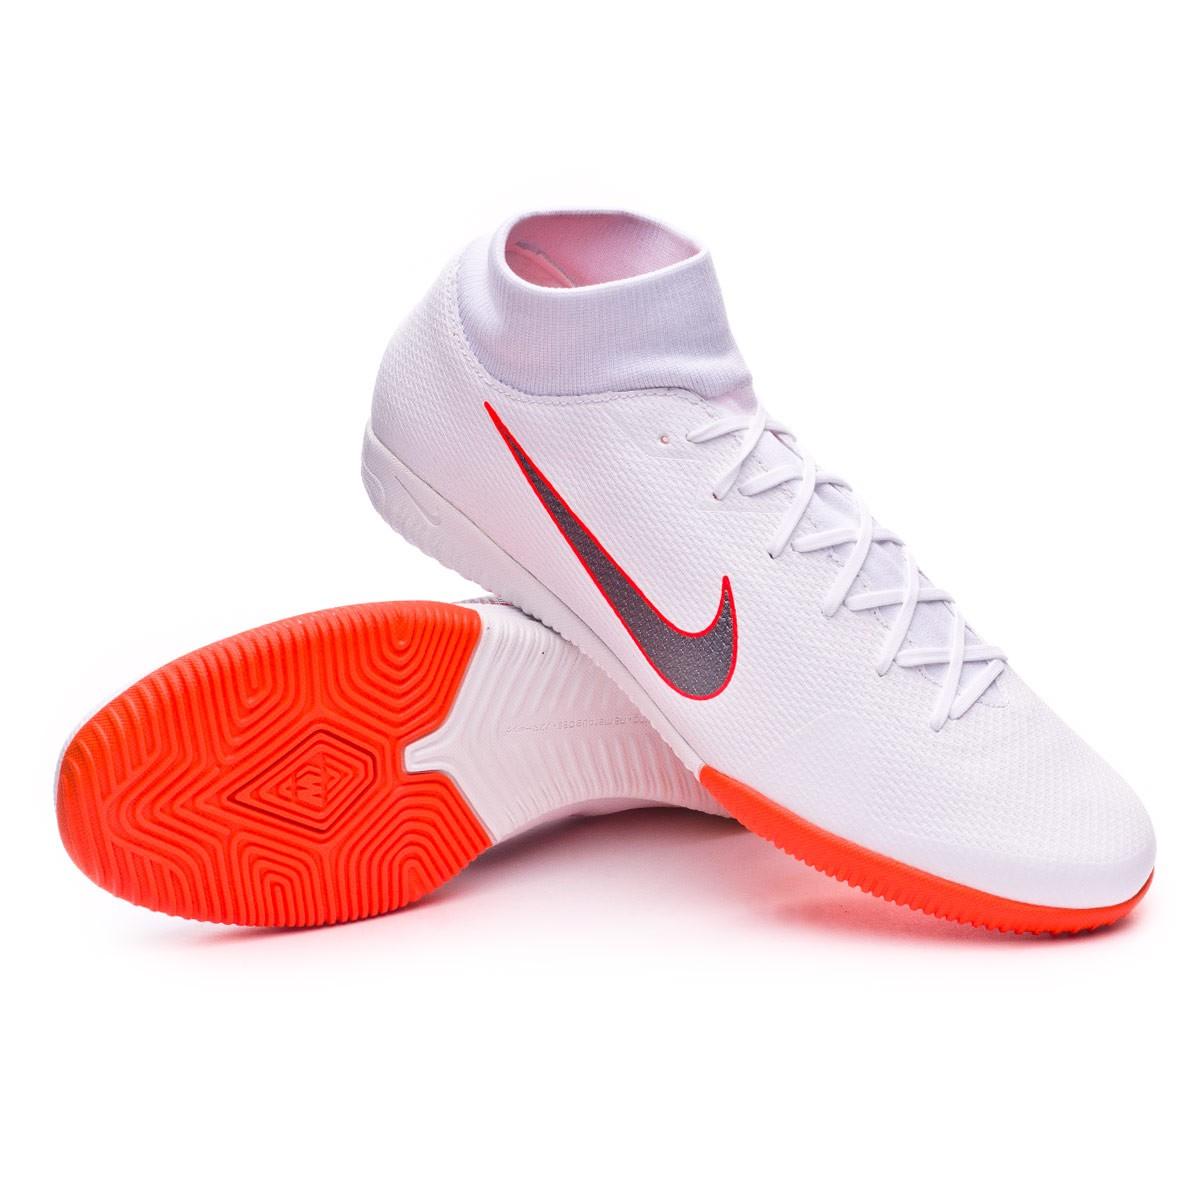 fa894c5fc4fc Futsal Boot Nike Mercurial SuperflyX VI Academy IC White-Metallic ...